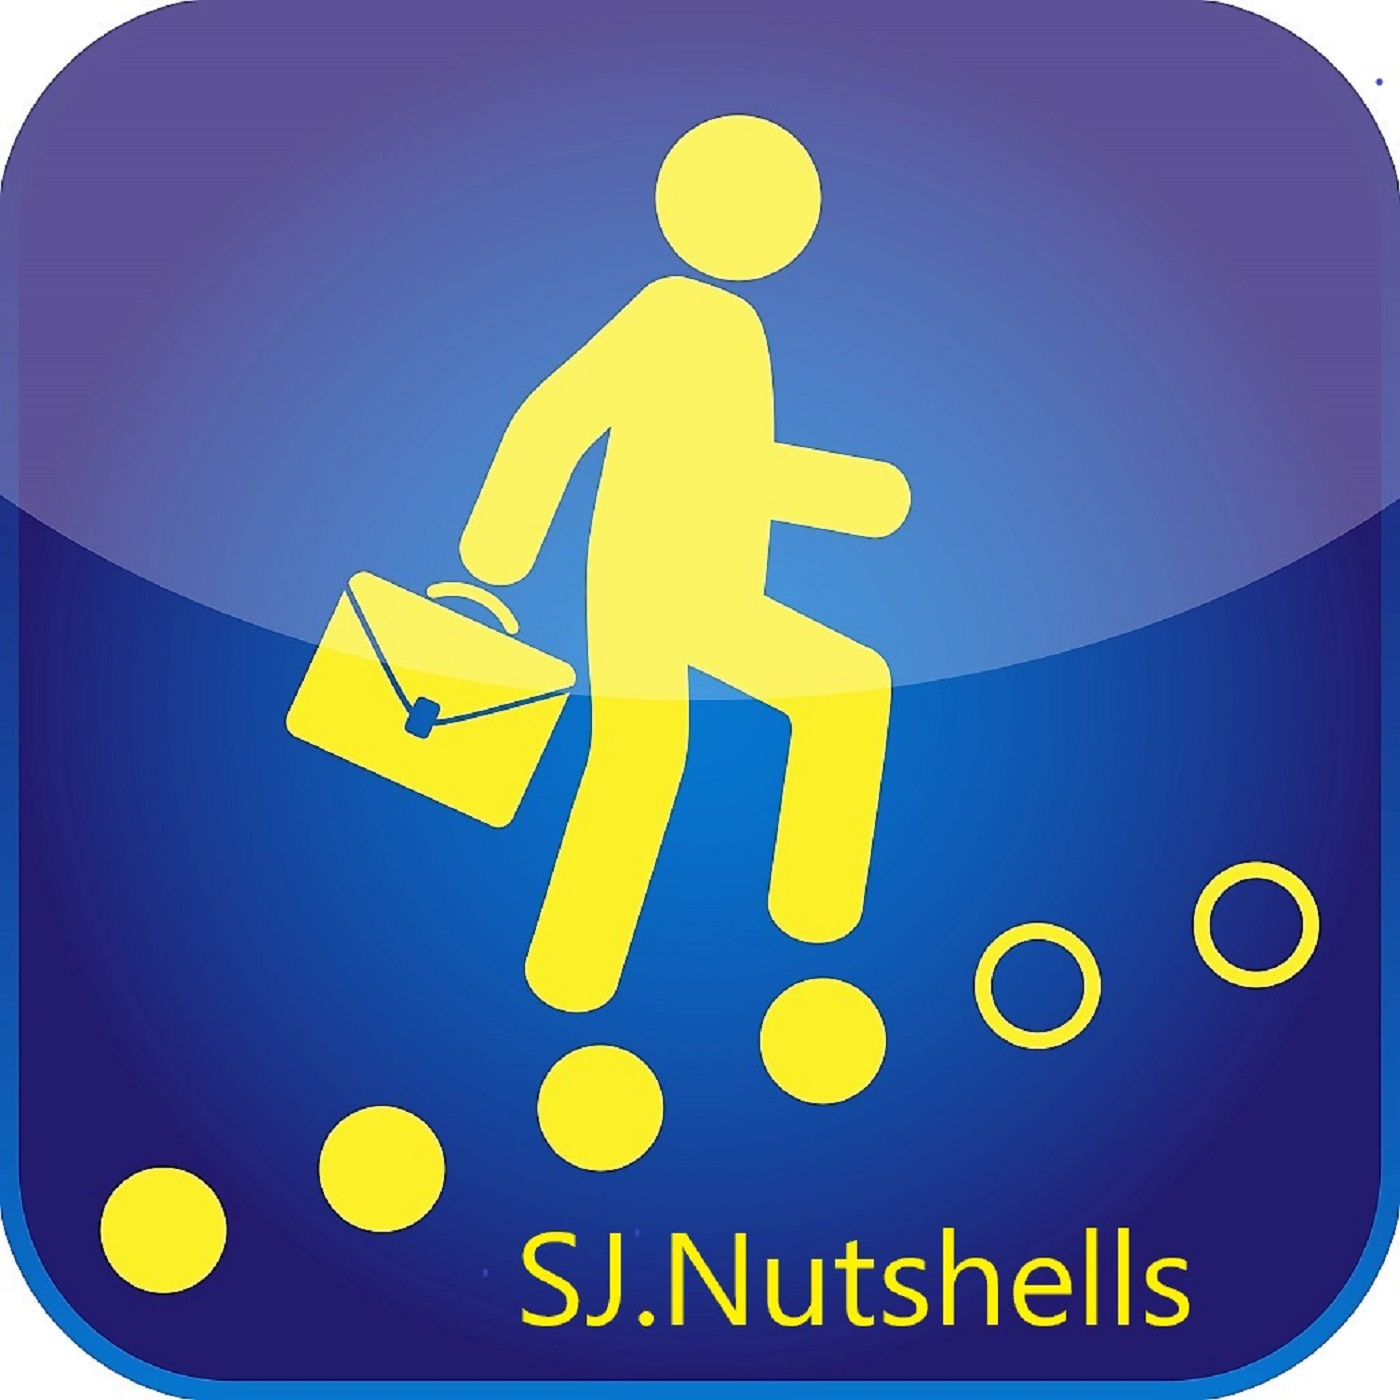 SJNutshells' Podcast بودكاست ما قل ودل show art